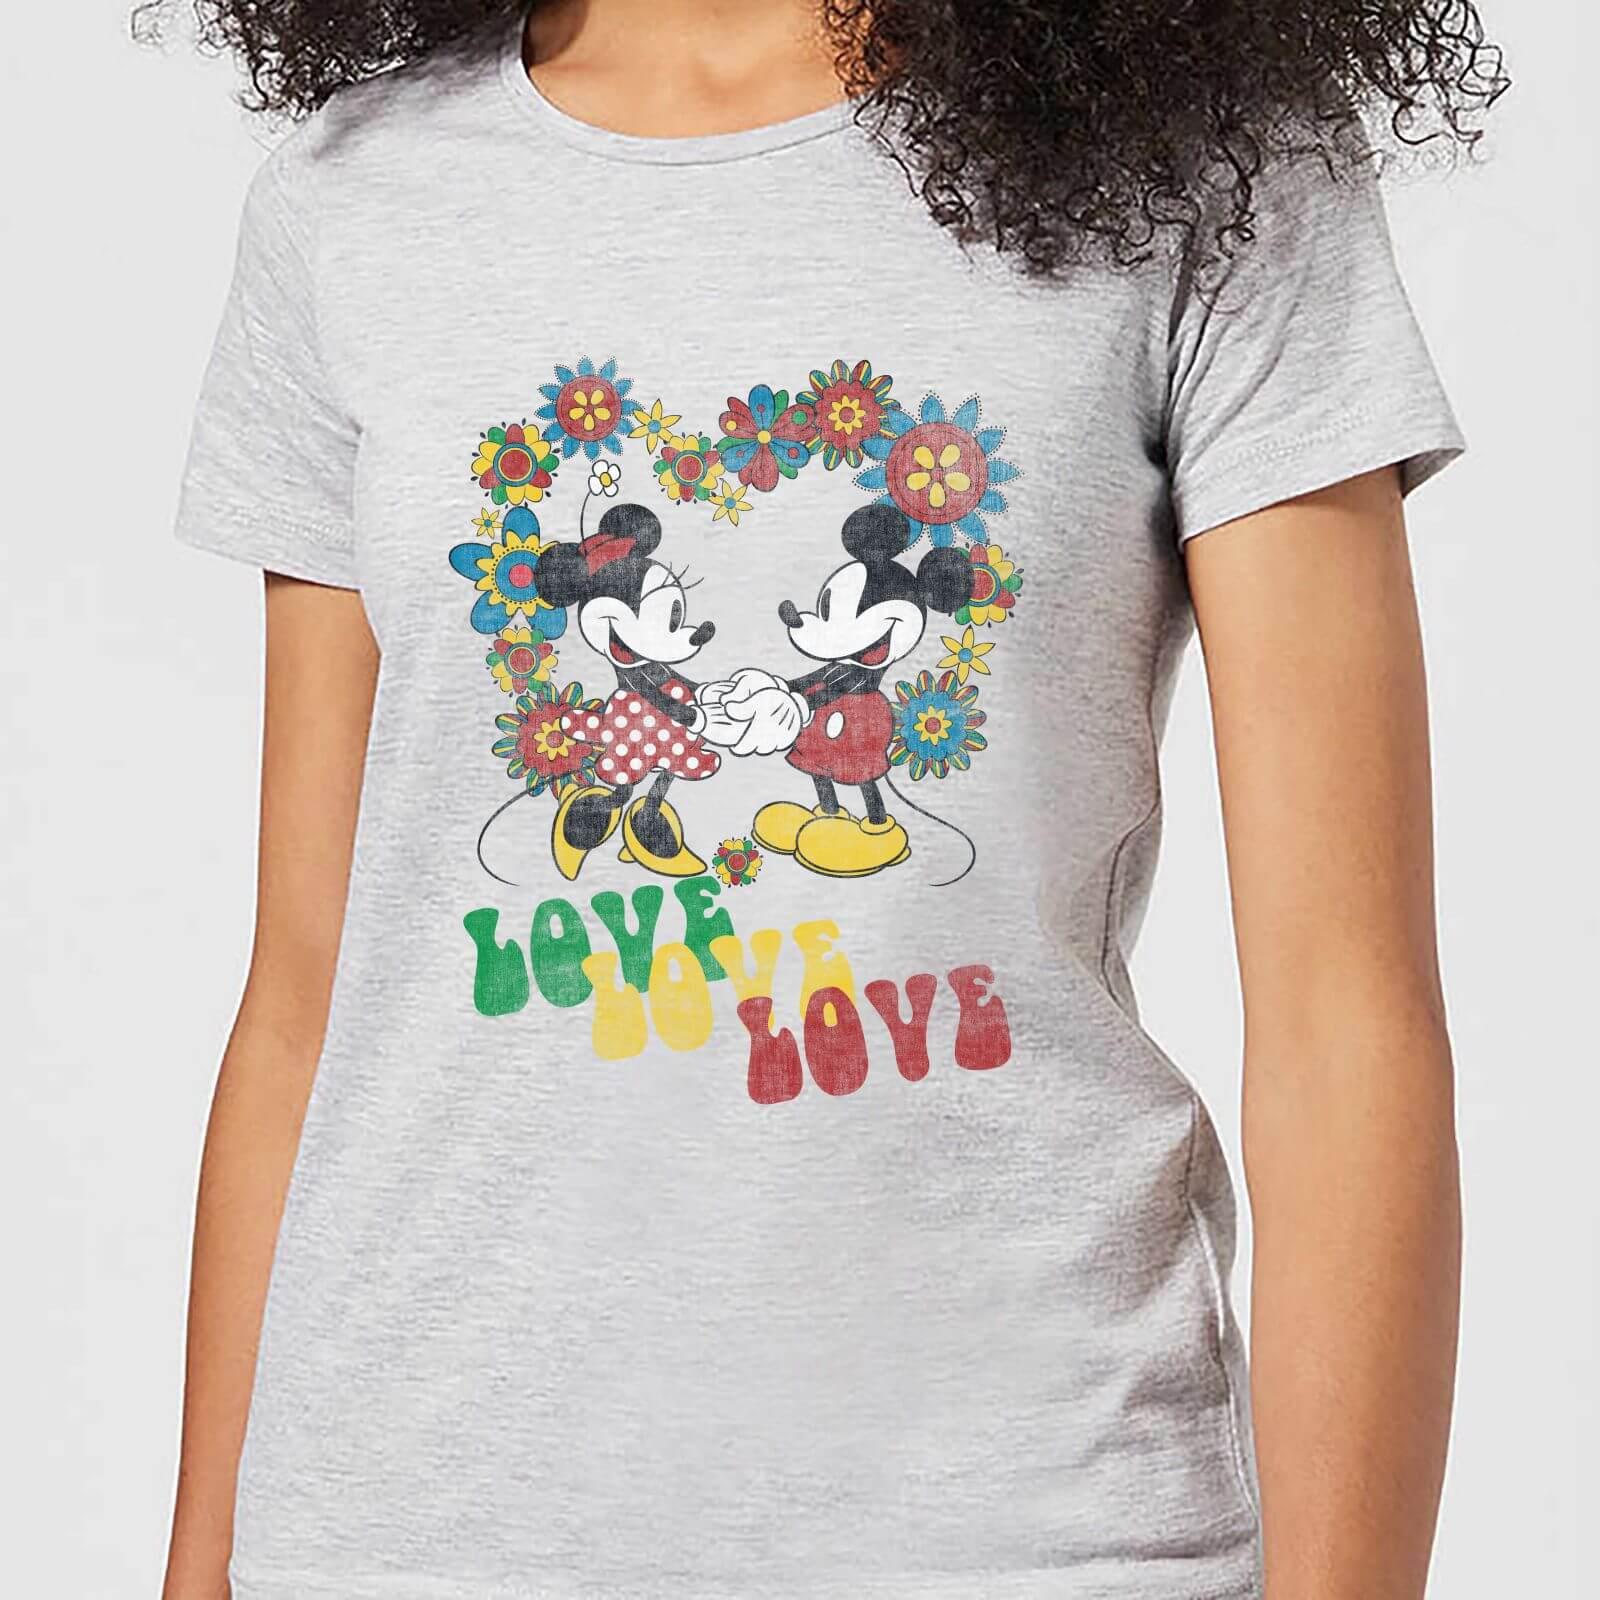 Disney Mickey Mouse Hippie Love Women's T-Shirt - Grey - M - Grey